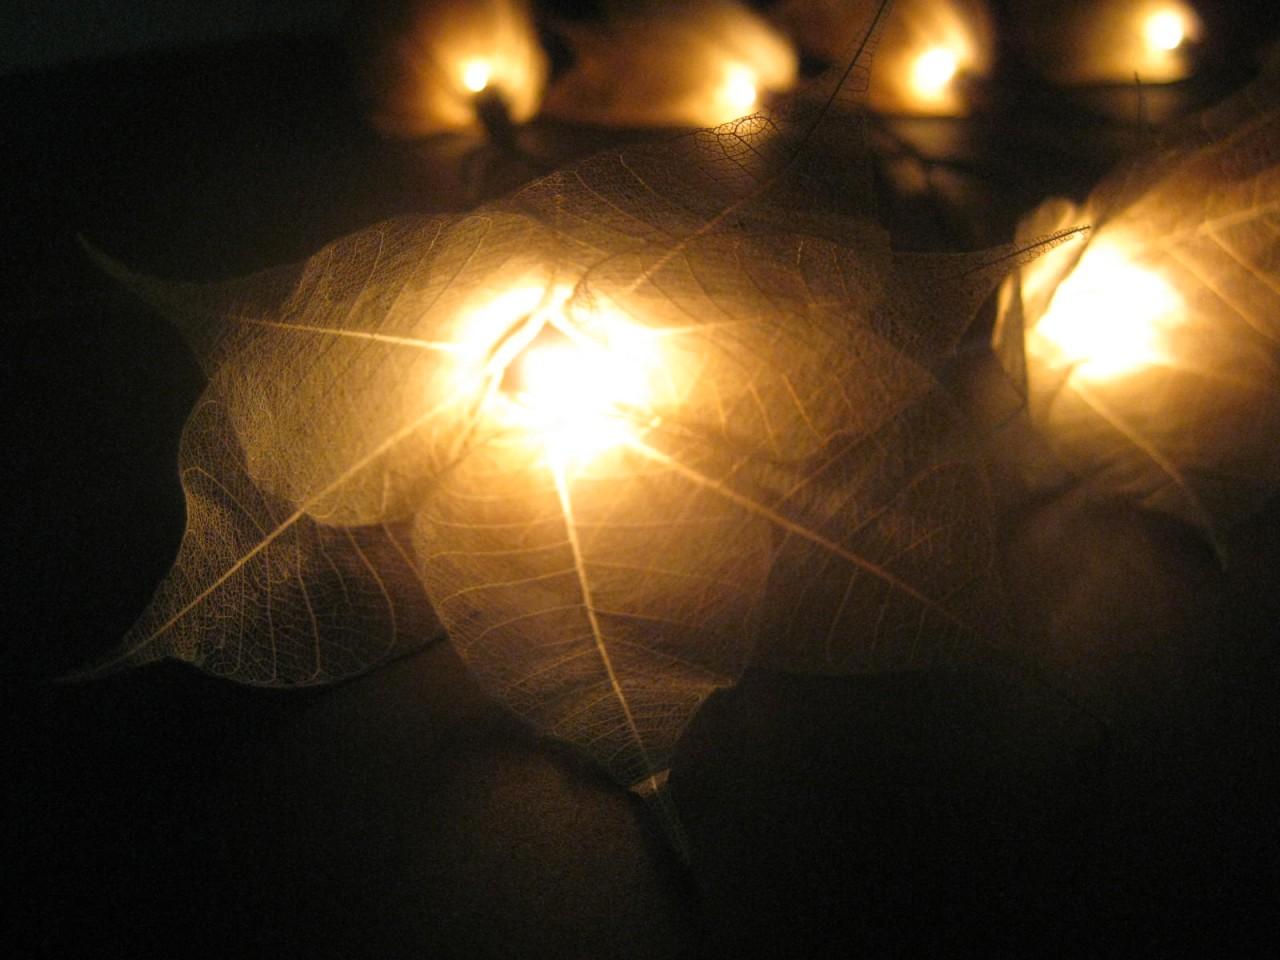 20 GOLD Battery Powered Star Flower LED String Fairy Lights Christmas Party Gift eBay